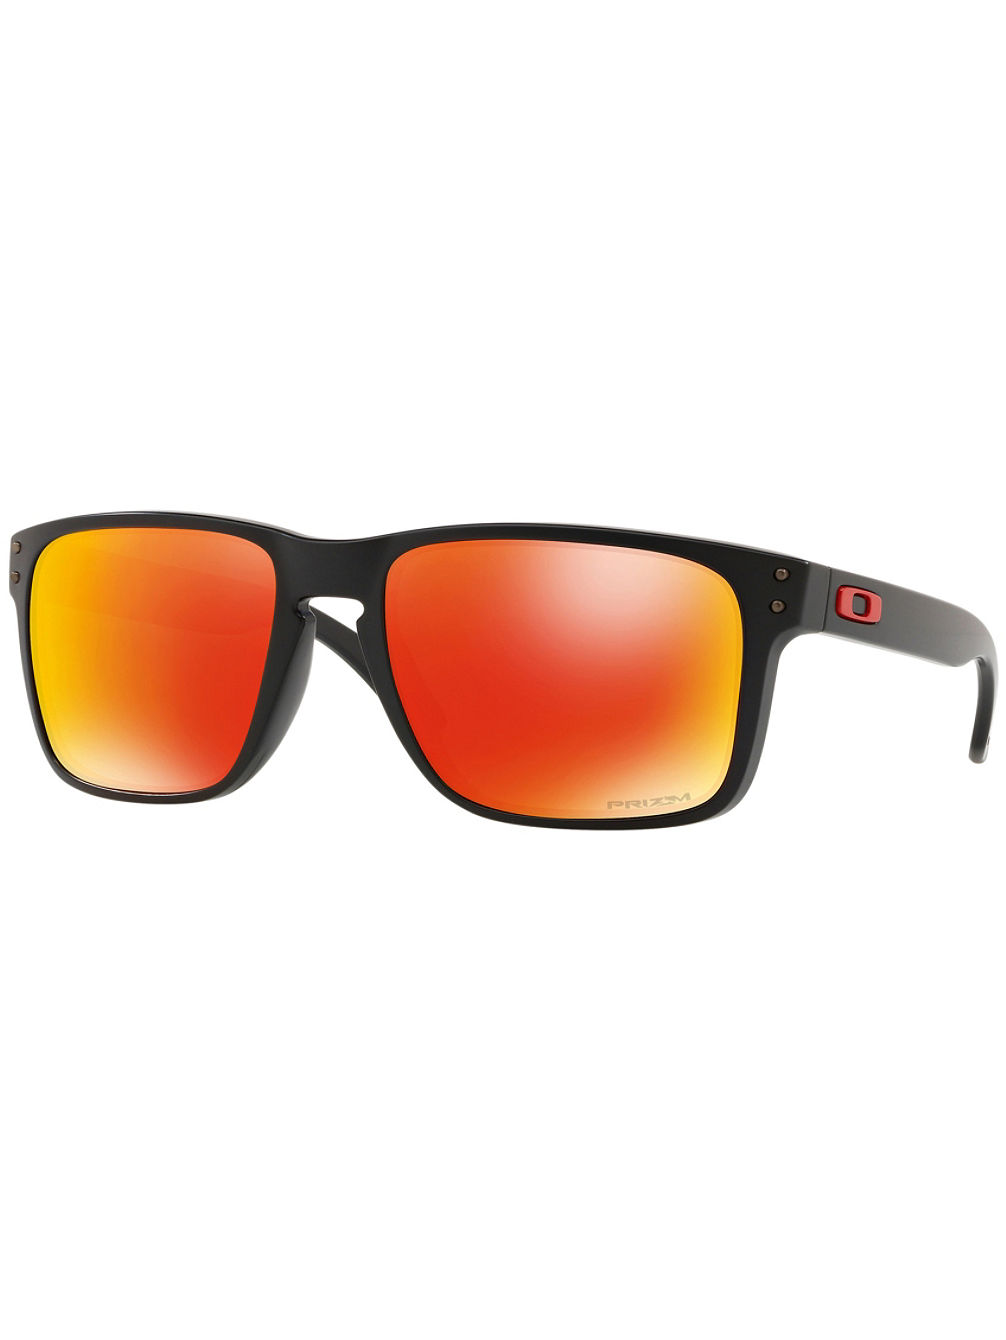 67b192d610 Compra Oakley Holbrook XL Matte Black Gafas de Sol en línea en Blue Tomato